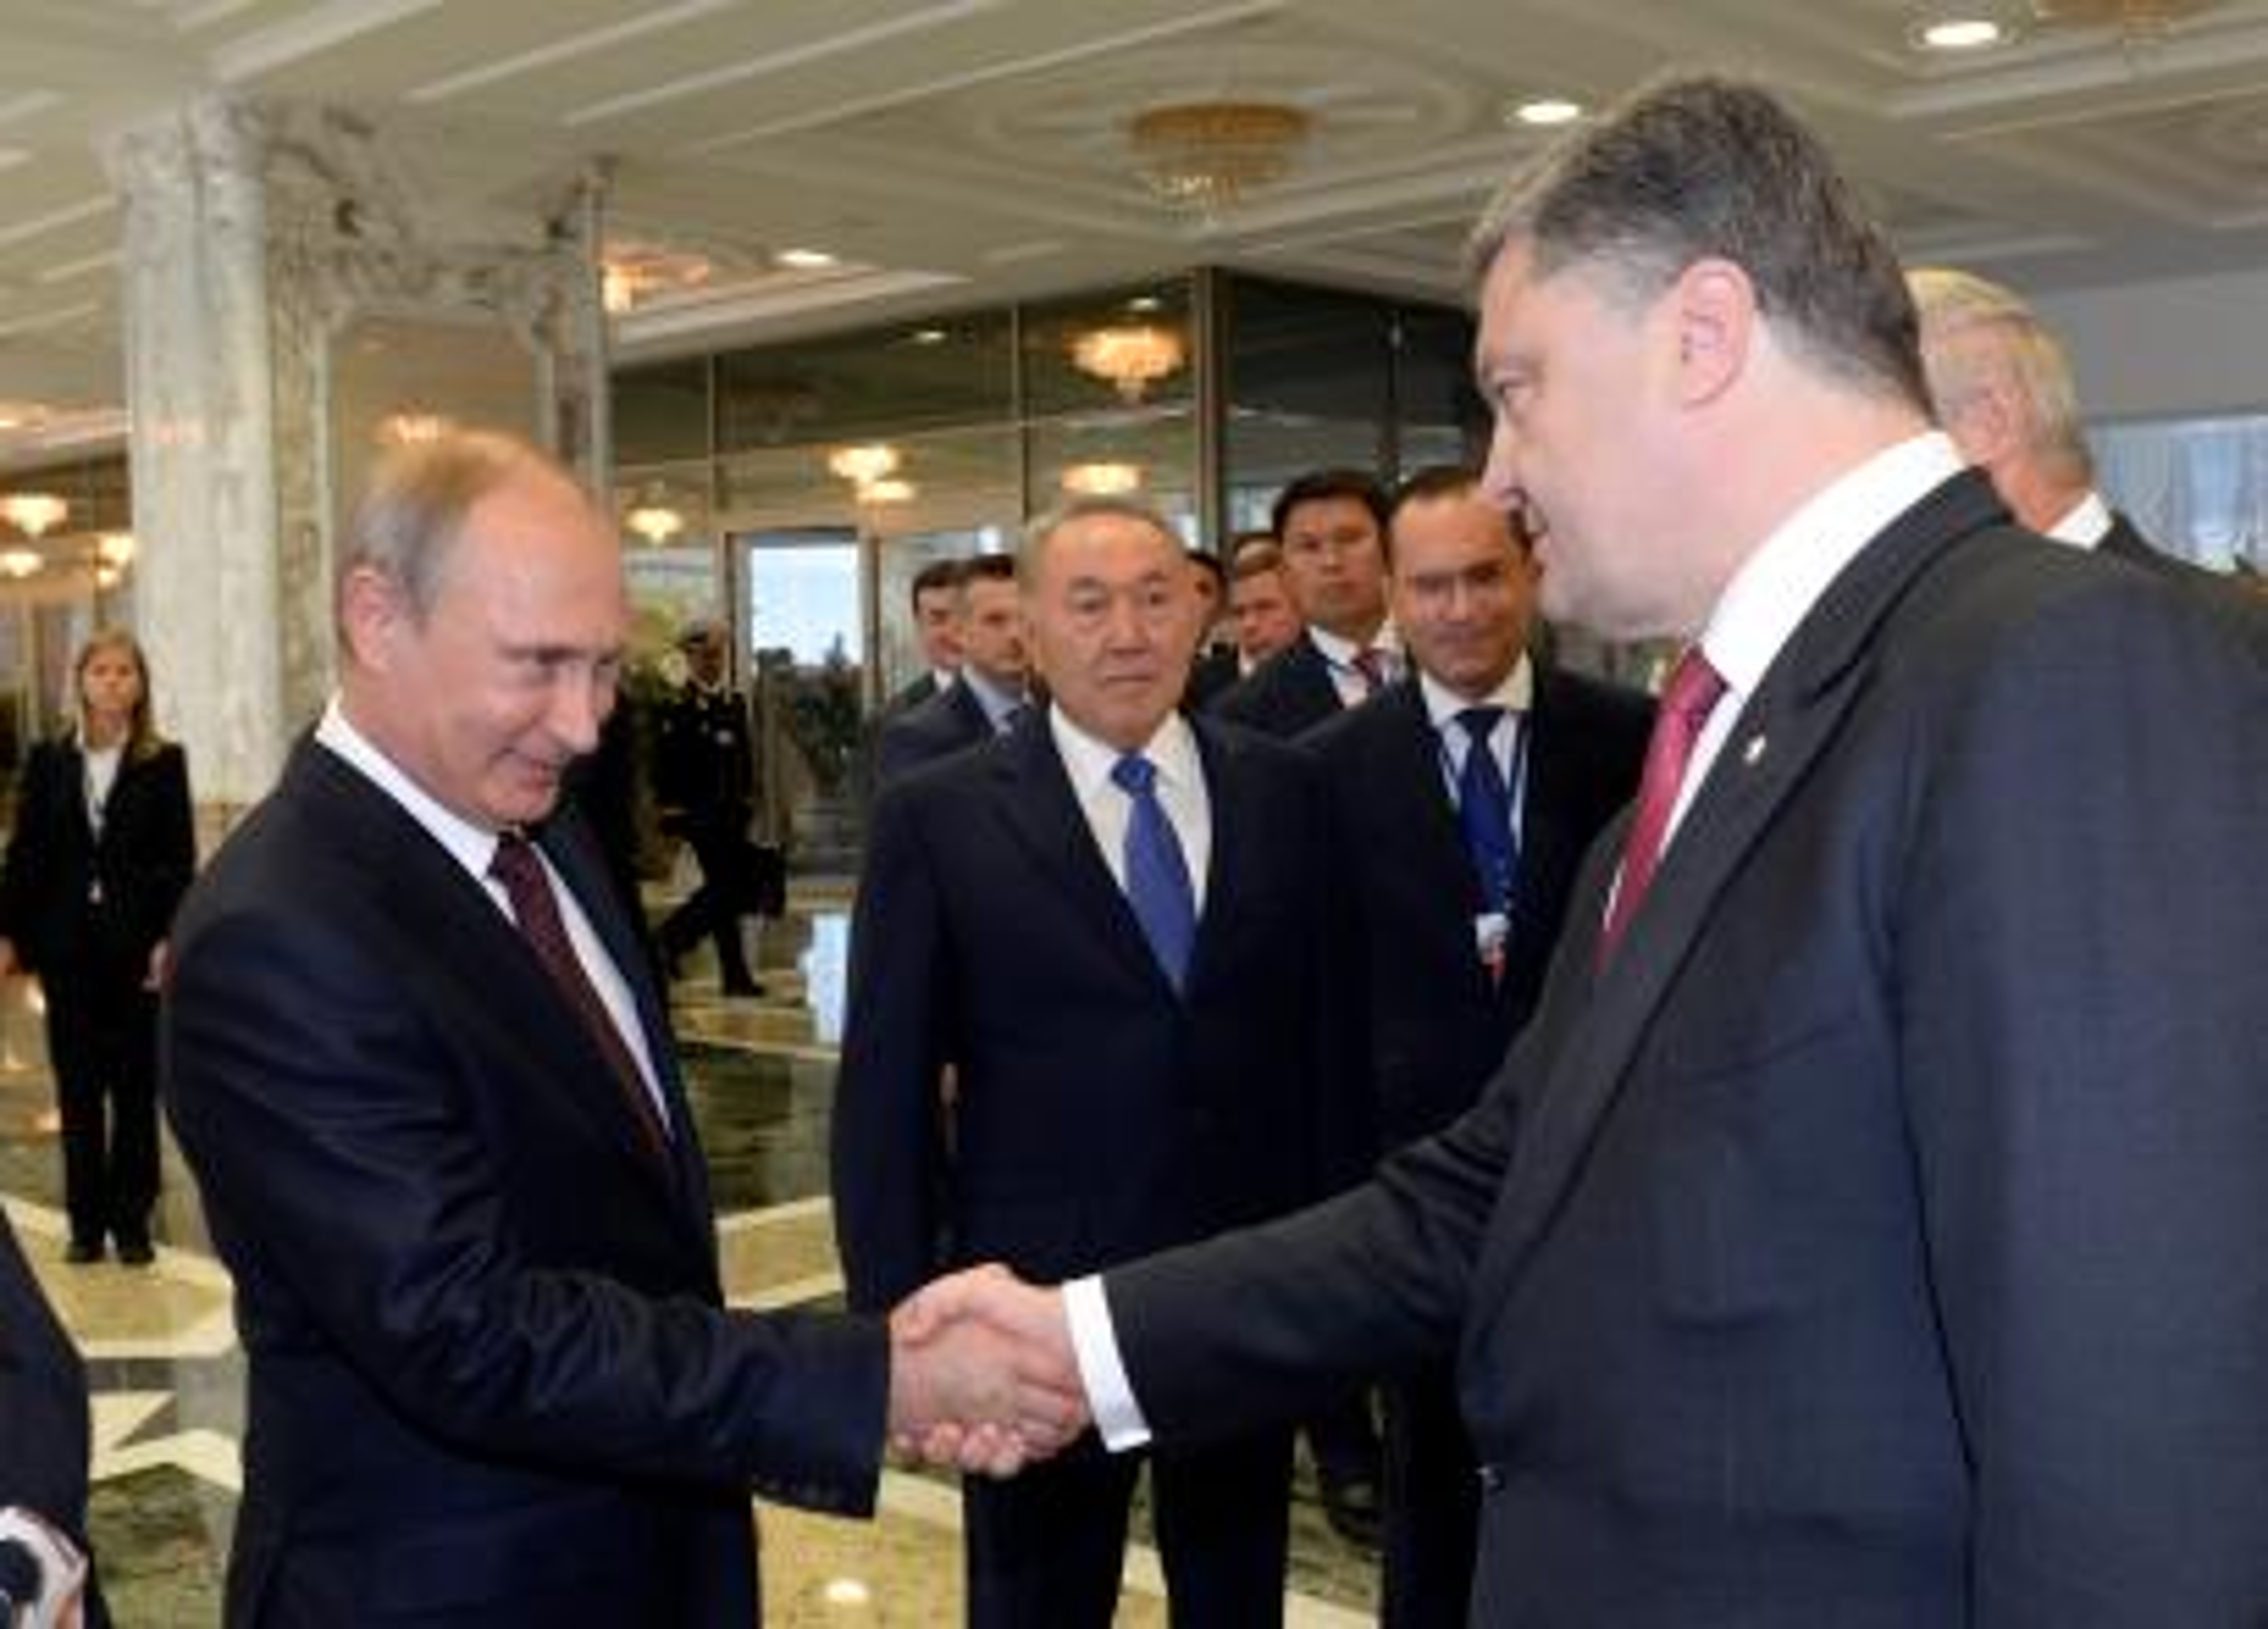 Russian President Vladimir Putin (L) shakes hands with his Ukrainian counterpart Petro Poroshenko, as Kazakh President Nursultan Nazarbayev (C) stands nearby, in Minsk August 26, 2014.